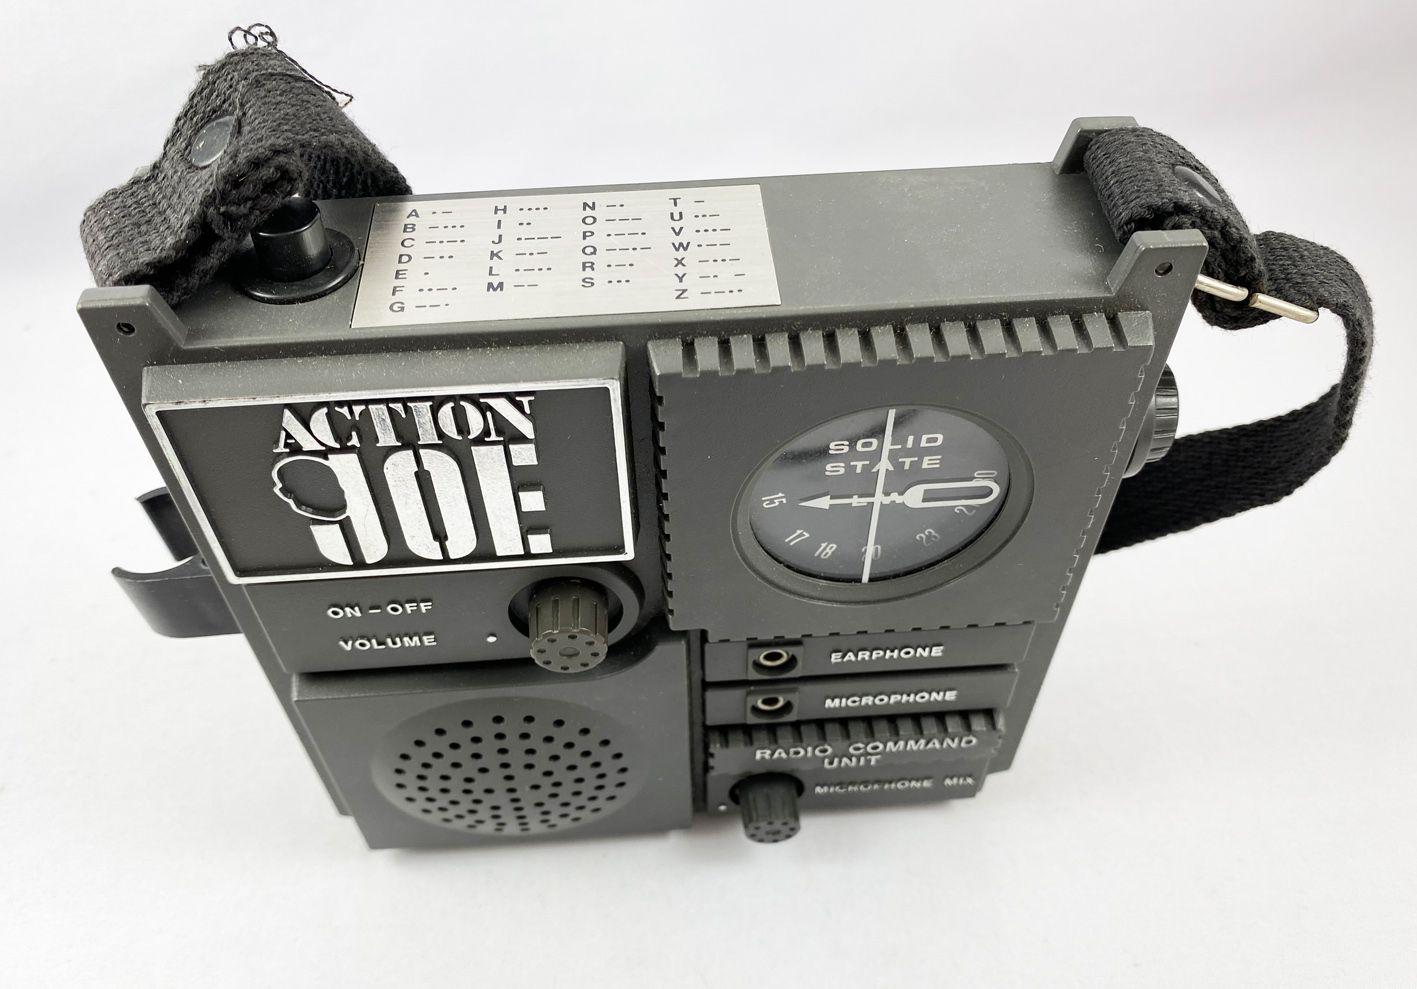 Action Joe - Radio Command Unit - Ref.7518